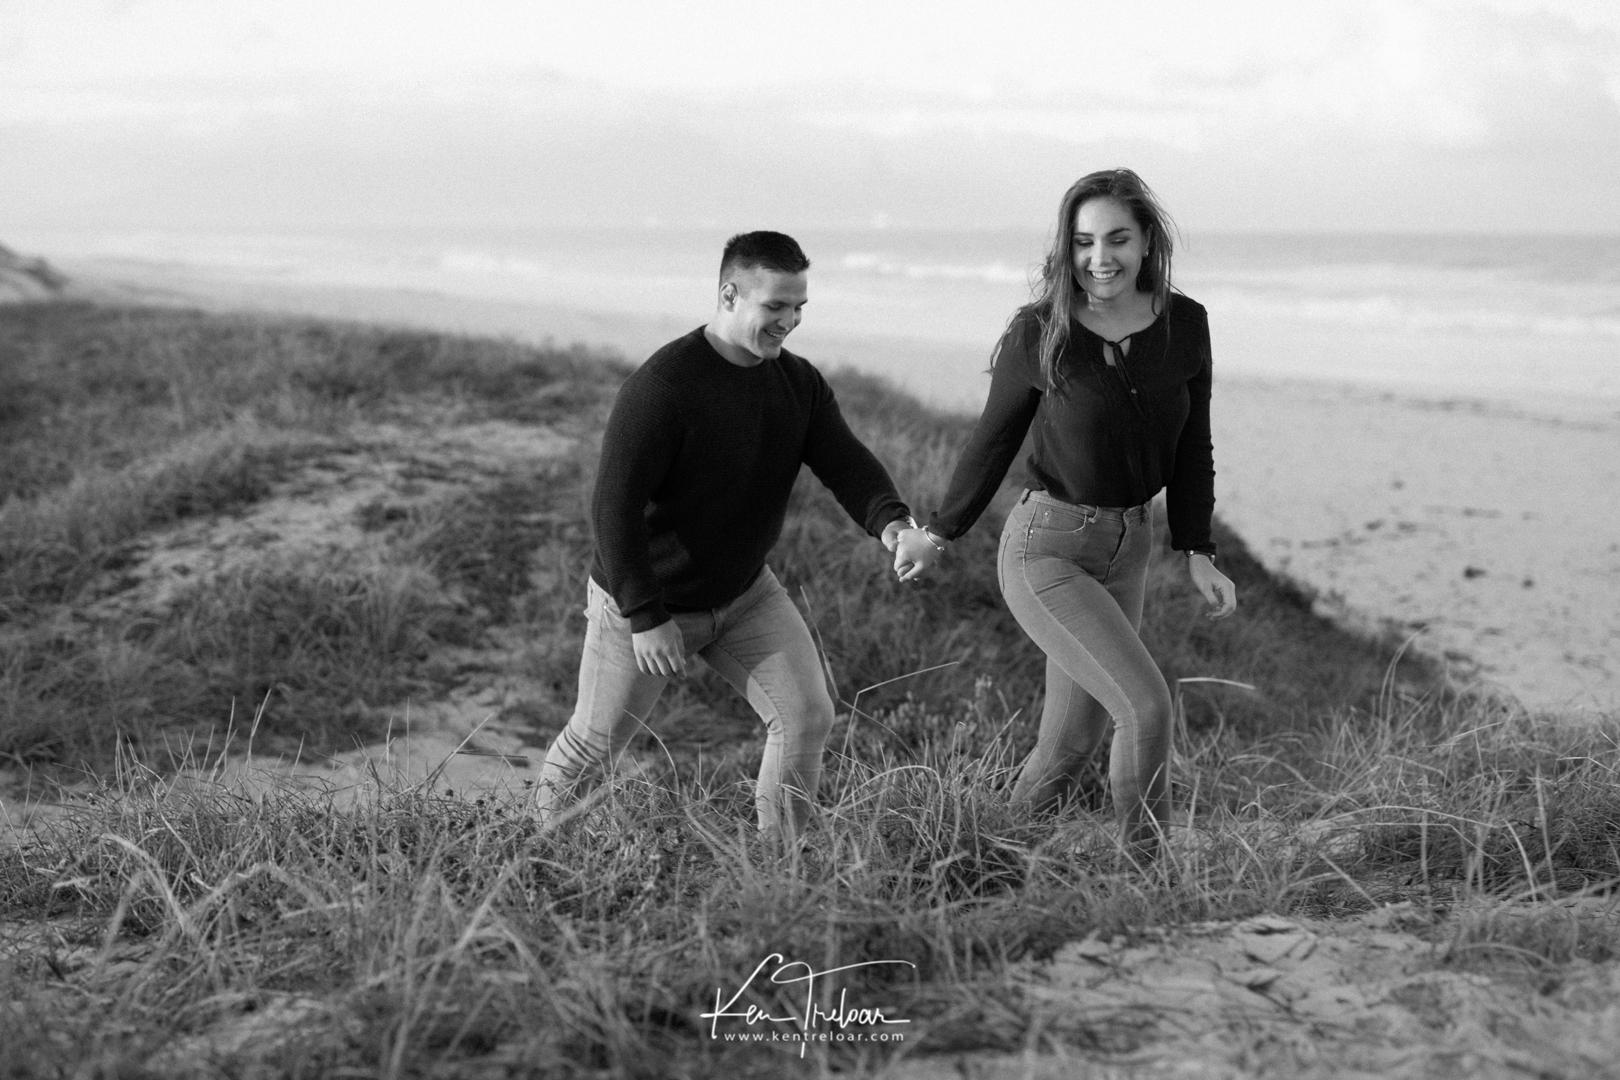 Ken Treloar - Romantic Couples photoshoot Cape Town 2019-37.jpg